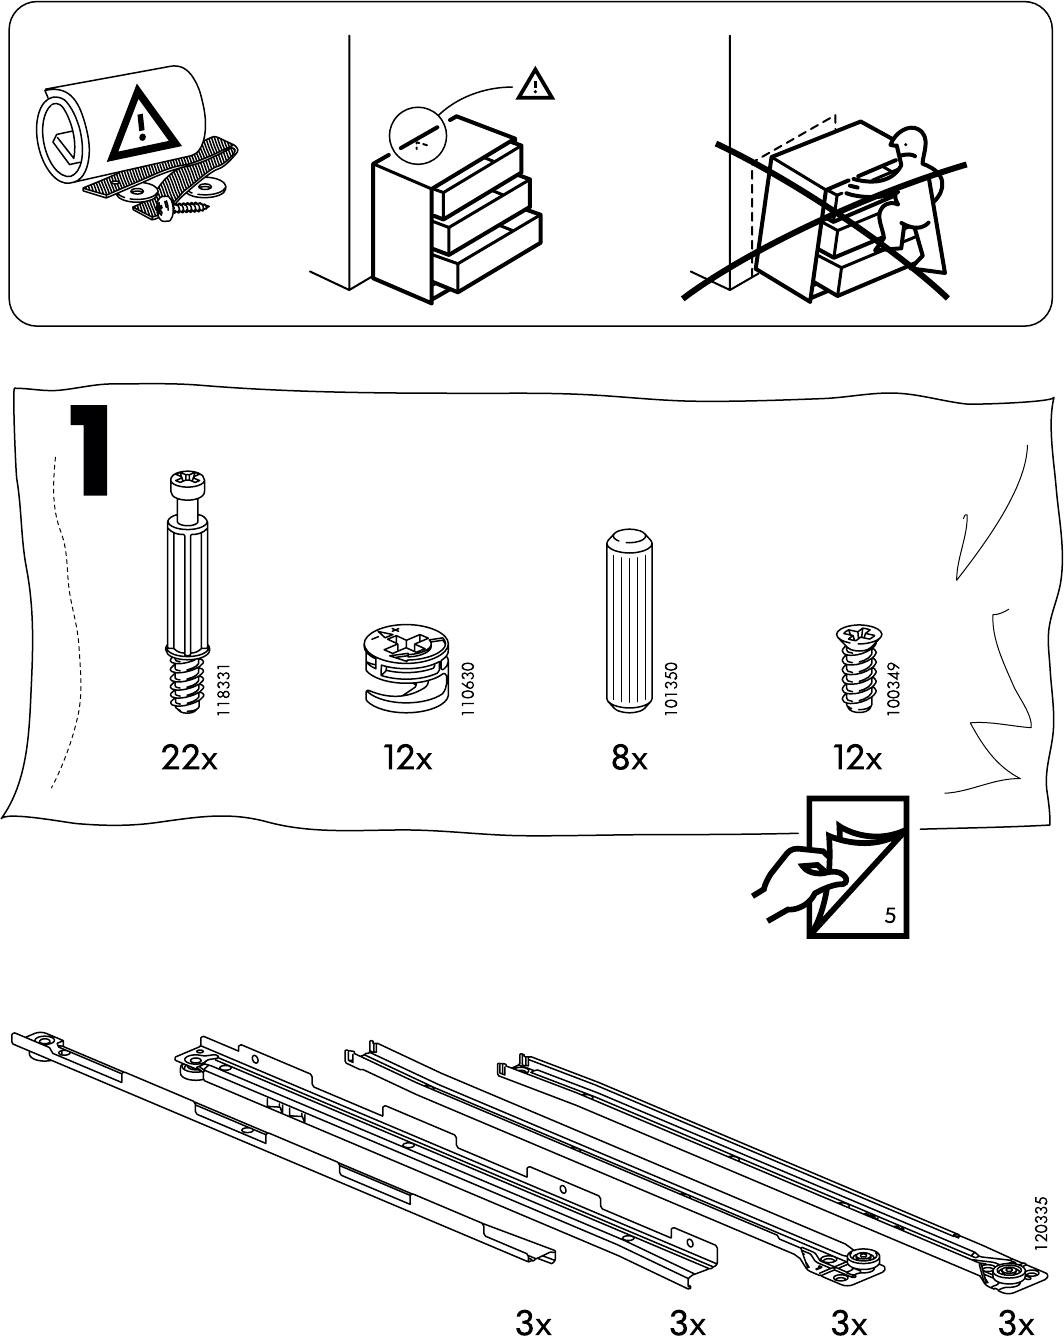 Hemnes Ladekast 3 Laden.Handleiding Ikea Hemnes Ladekast 3 Lades Pagina 1 Van 20